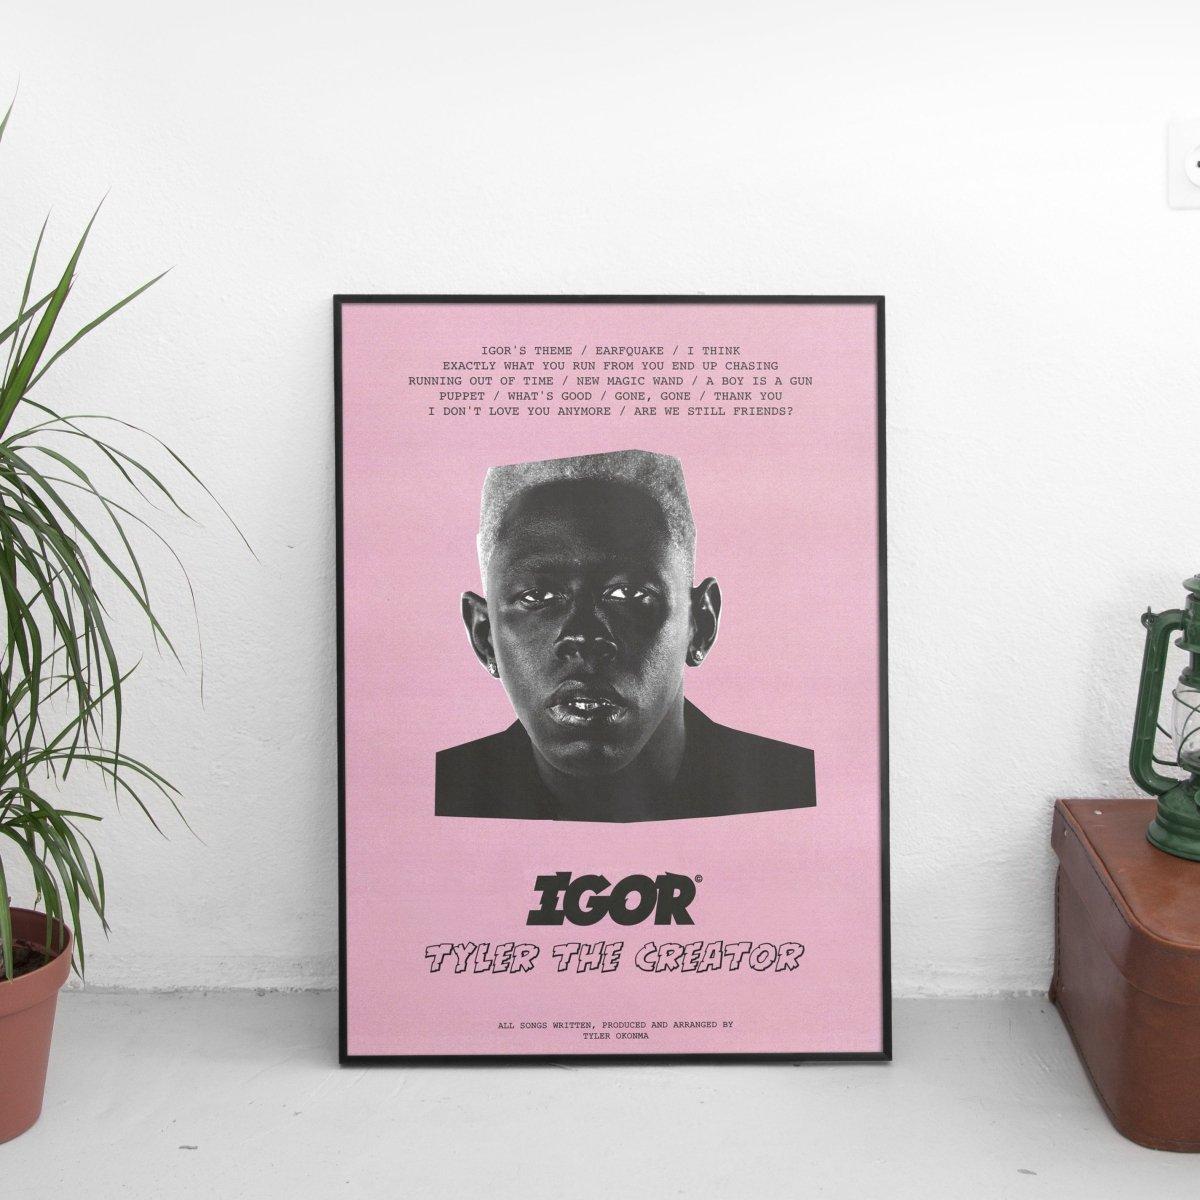 Tyler The Creator - Igor Tracklist Poster